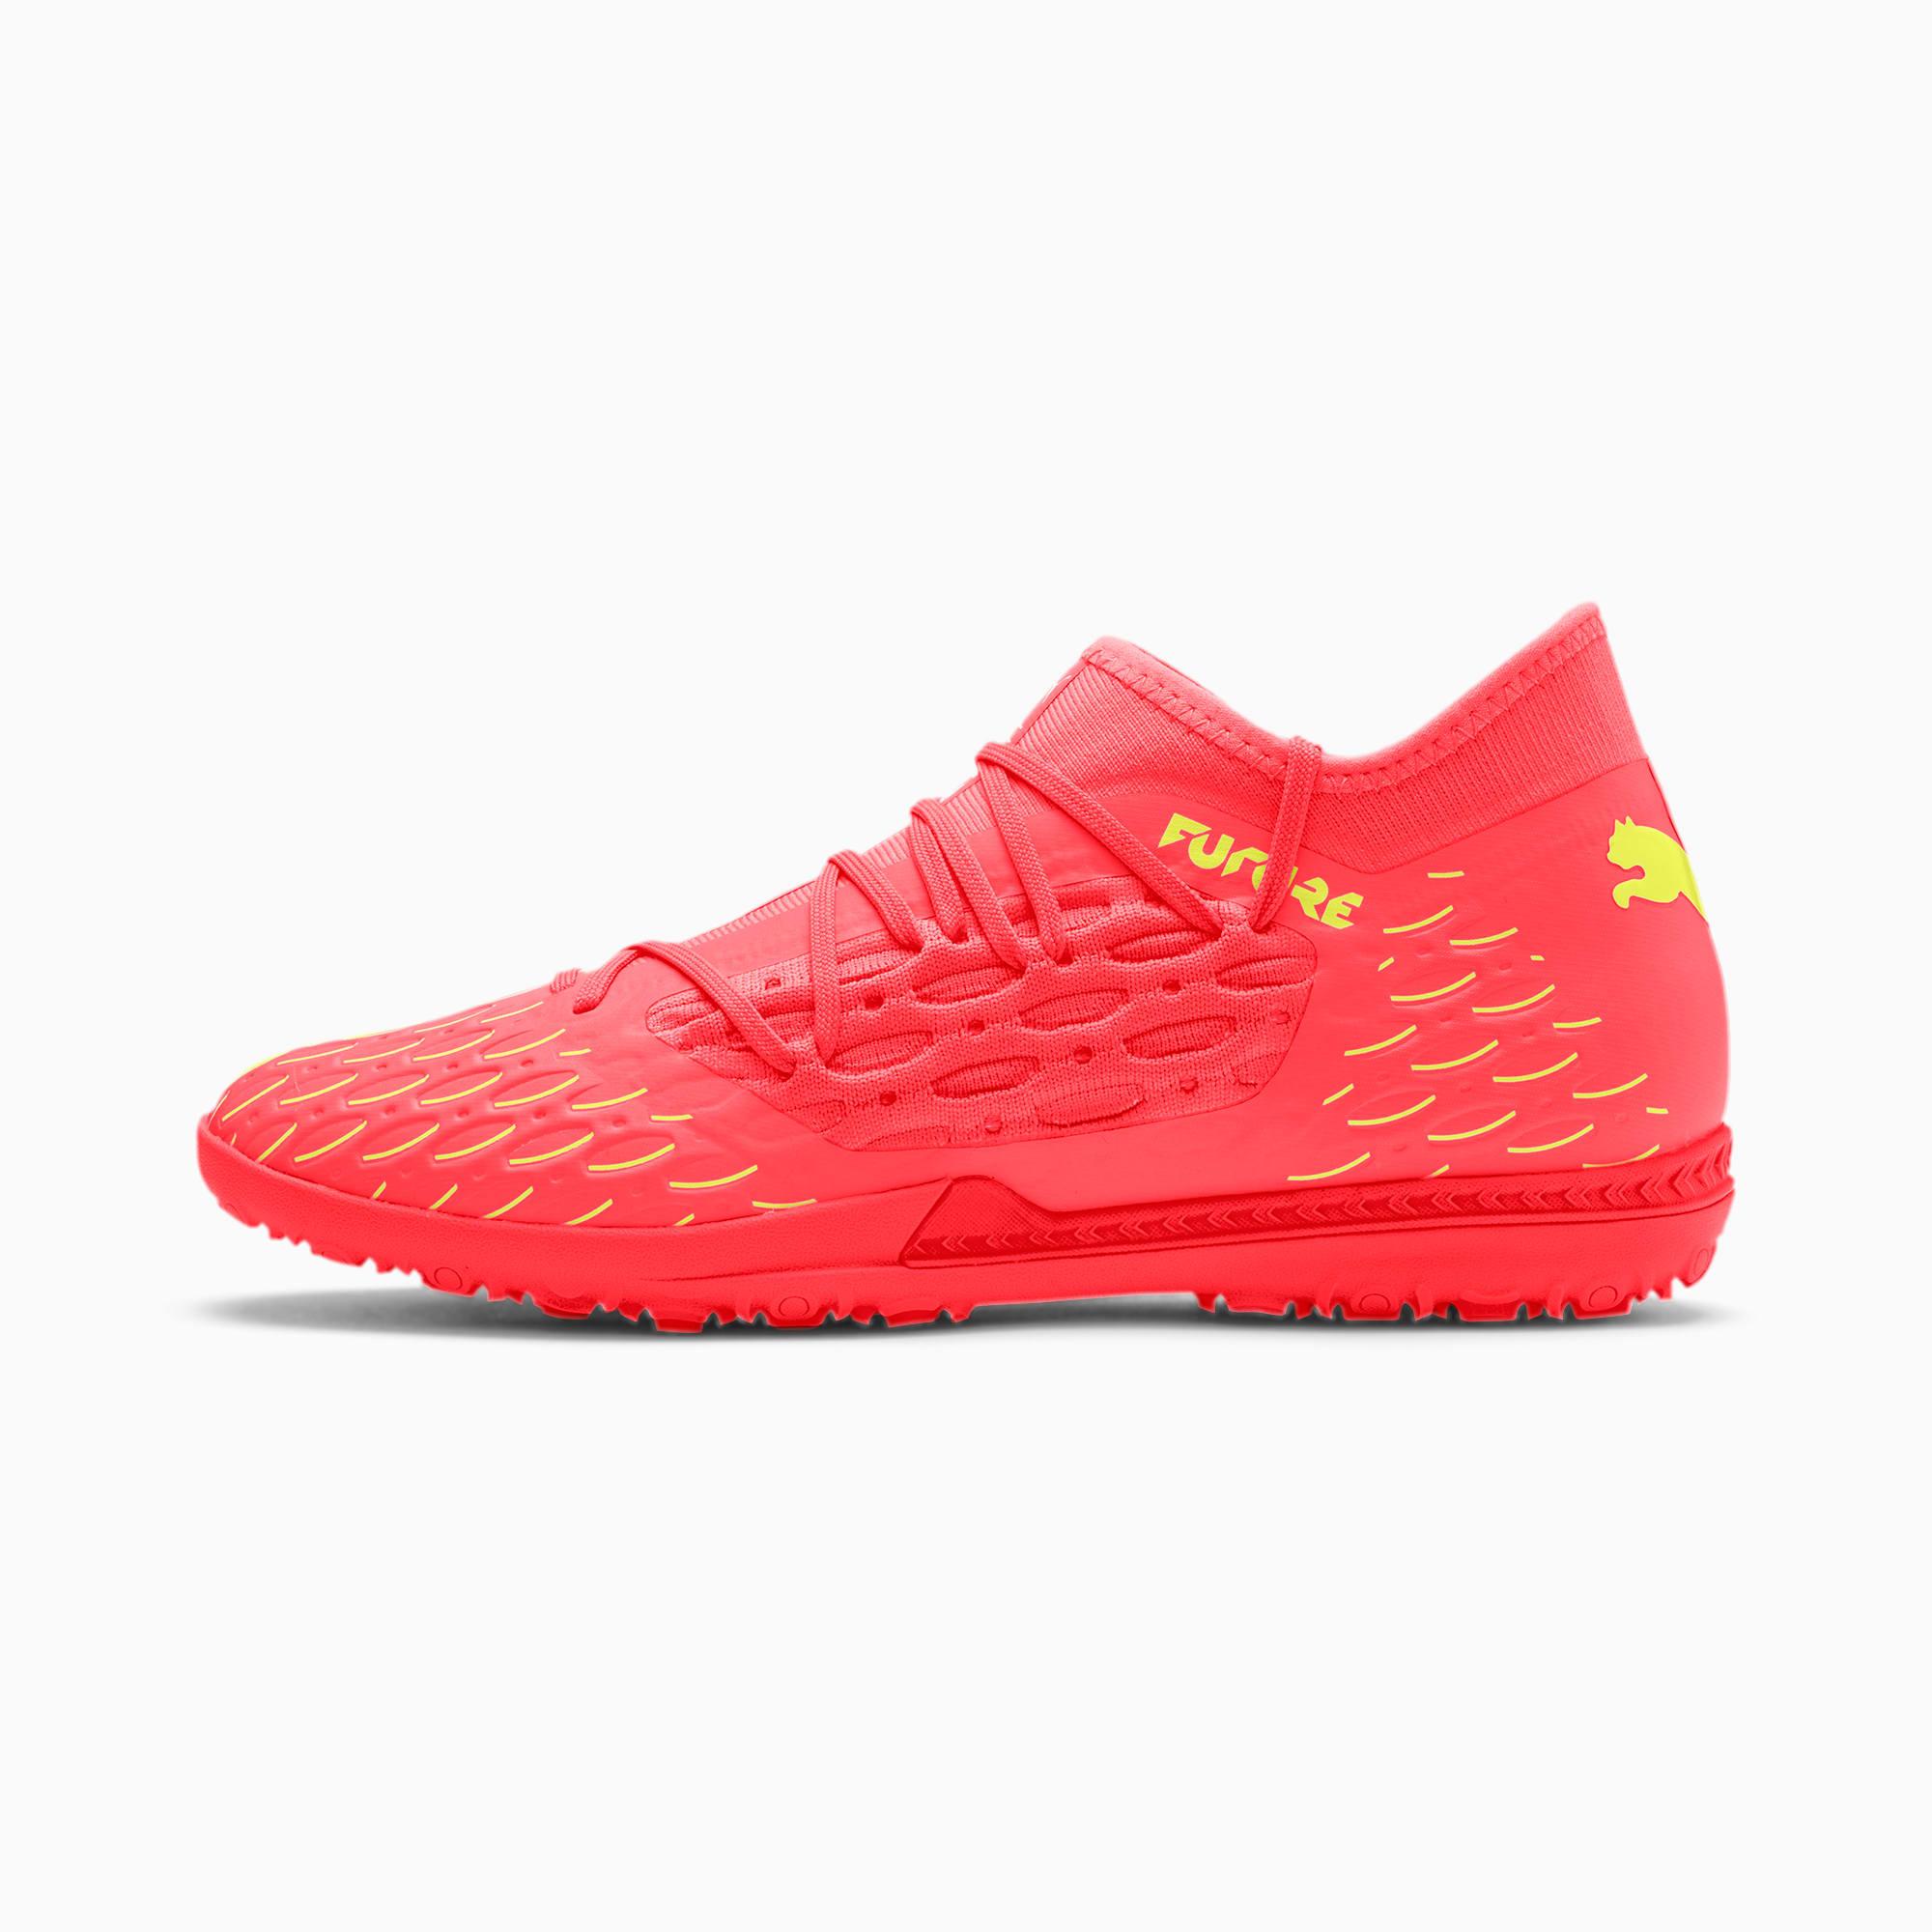 FUTURE 5.3 NETFIT TT Men's Soccer Shoes